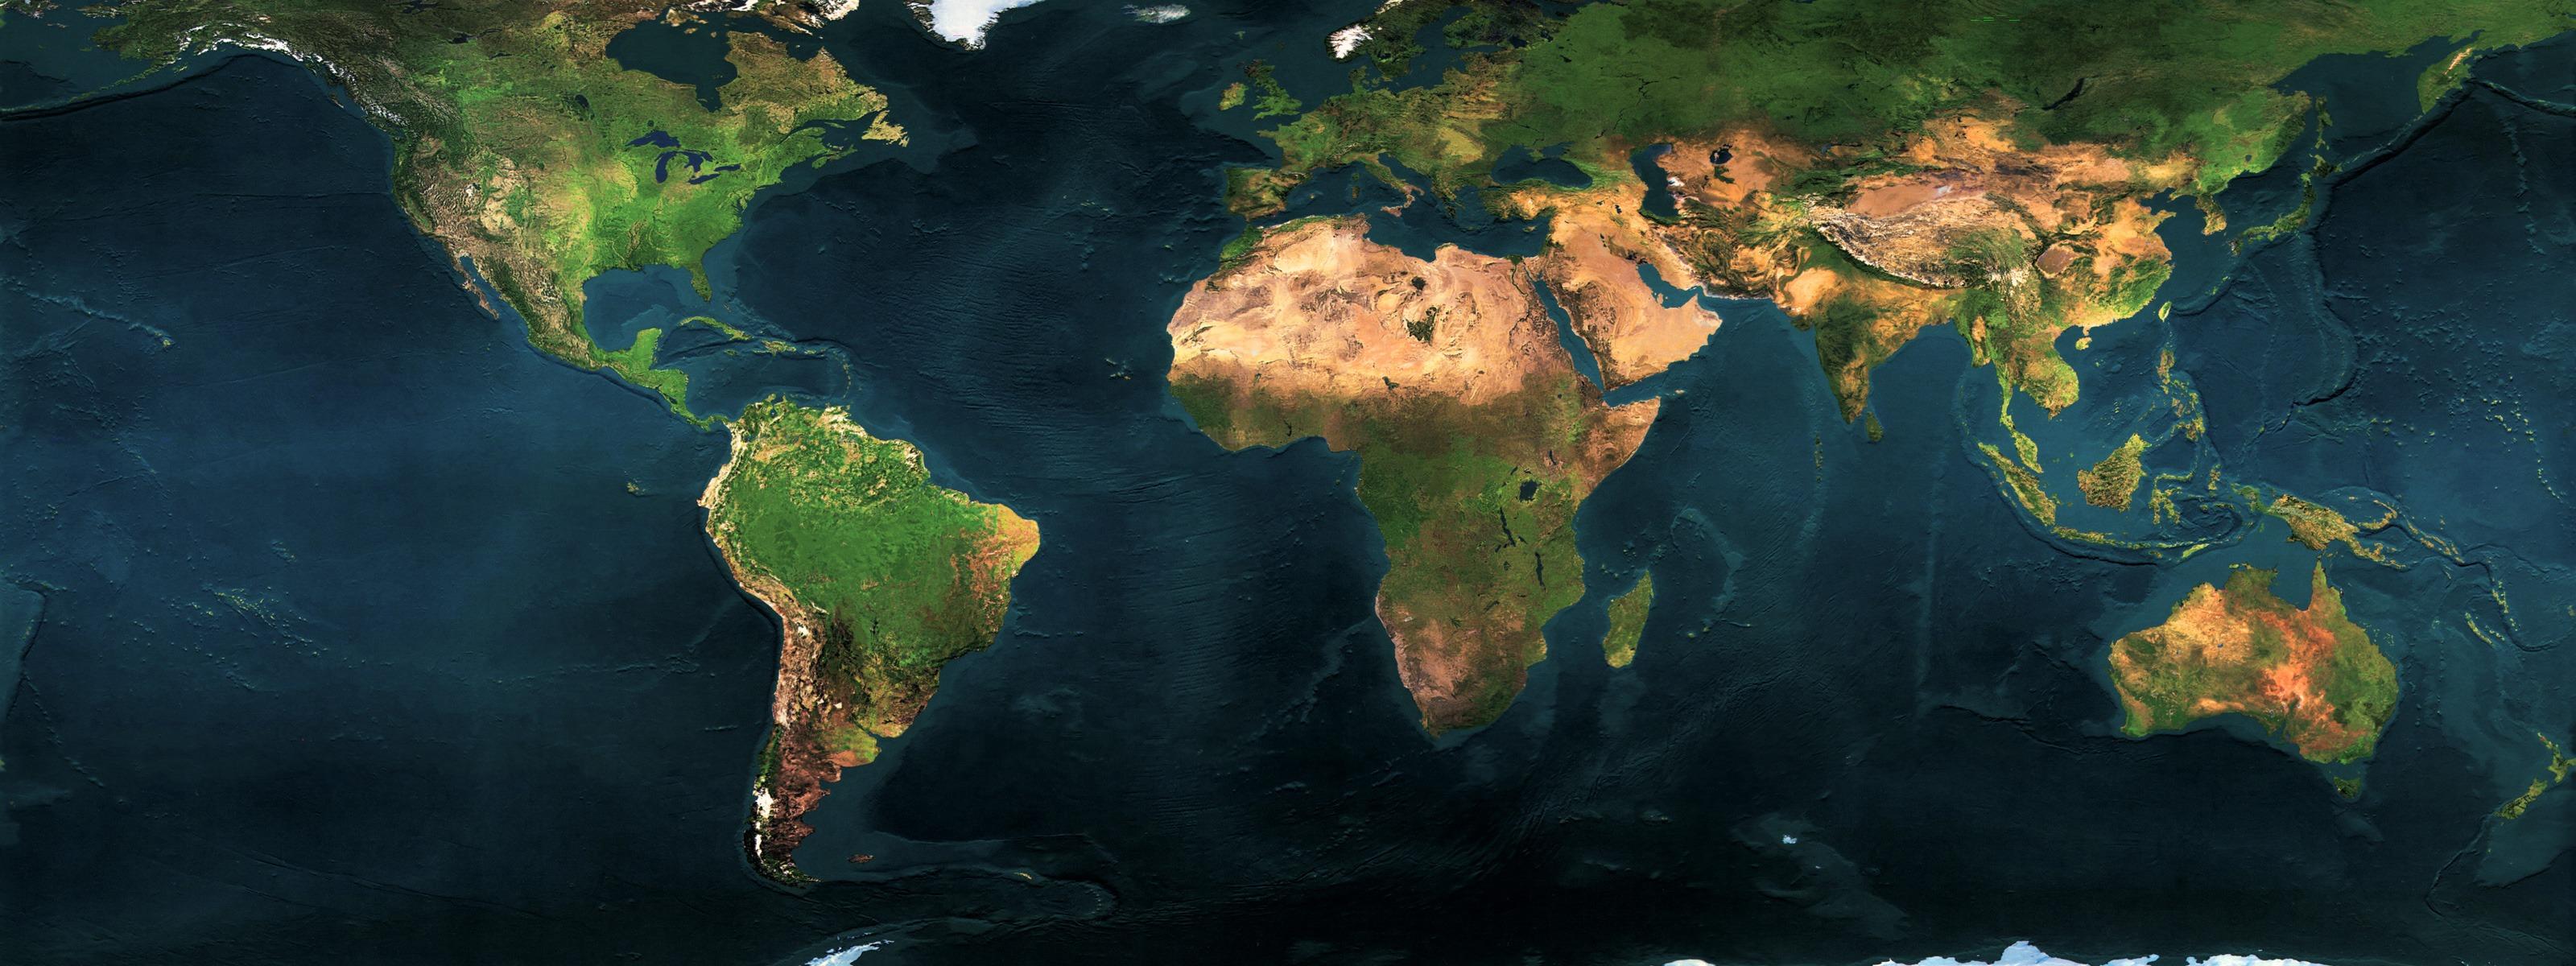 Earth maps desktop wallpaper wallpapersafari is an online imagefree worldmap wide wallpaper wallpapers world gumiabroncs Image collections